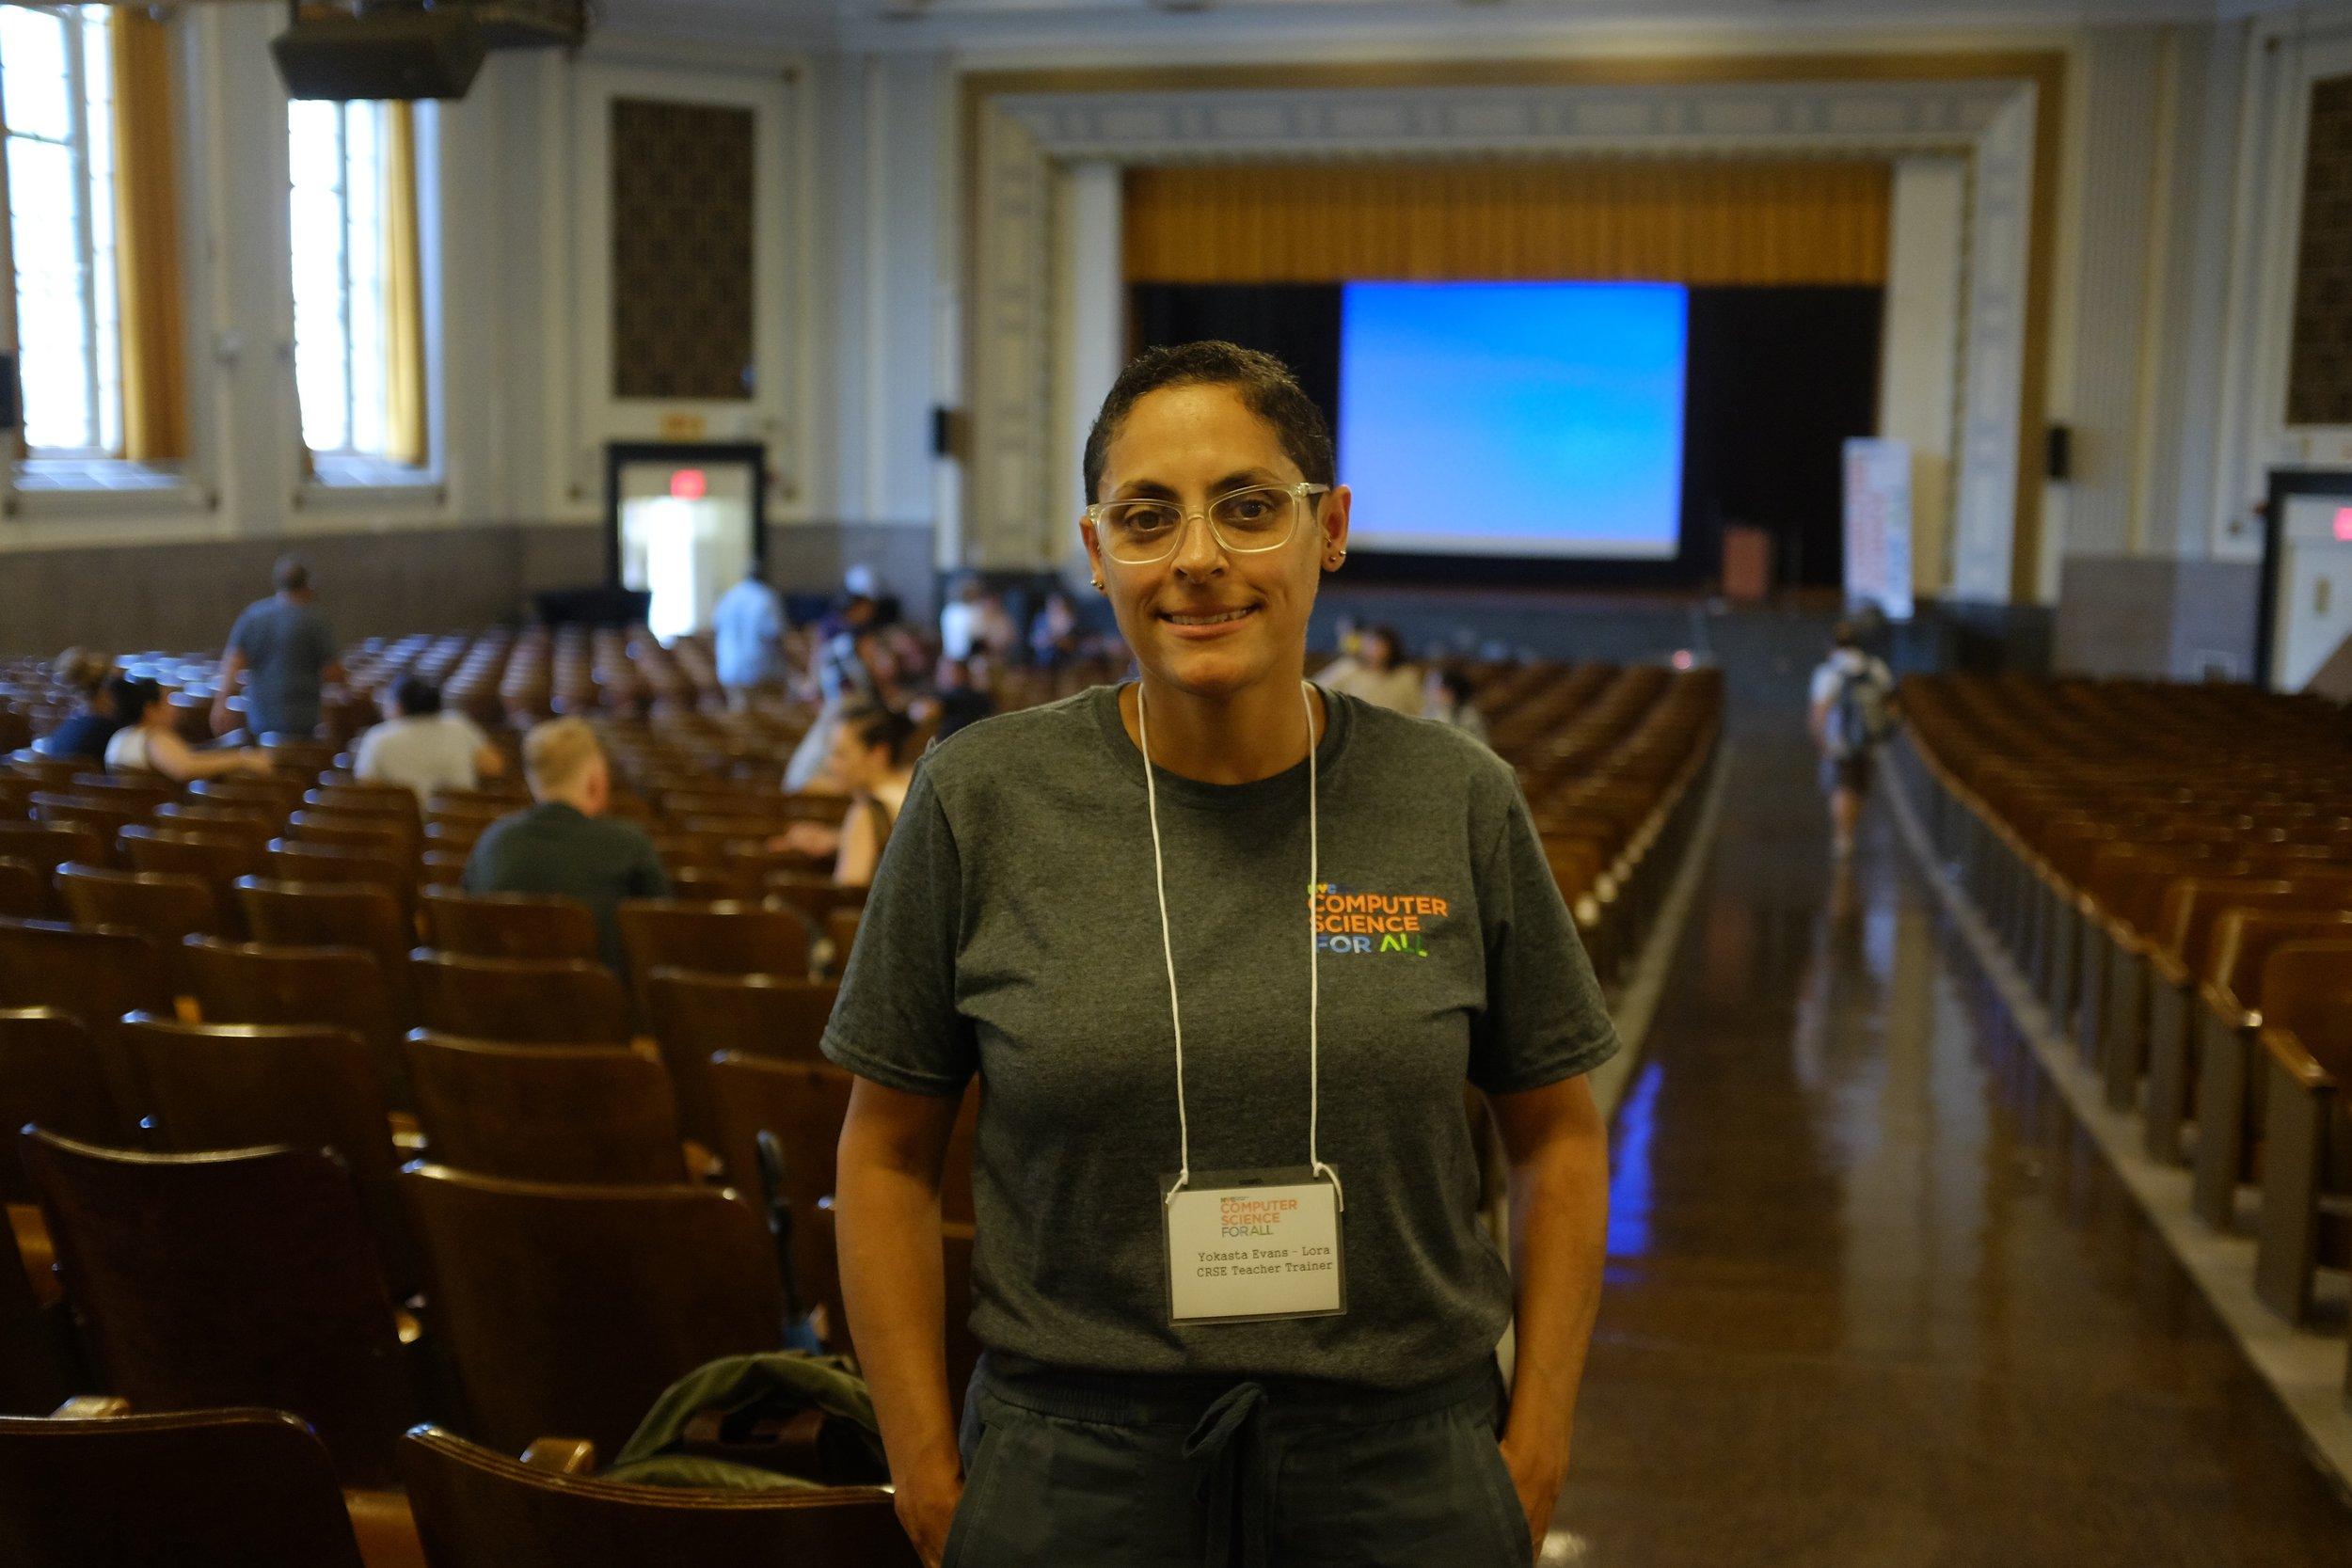 Yokasta Evans-Lora teaches at Brooklyn Arbor Elementary School and led CS trainings on culturally responsive pedagogy at the CS Institute